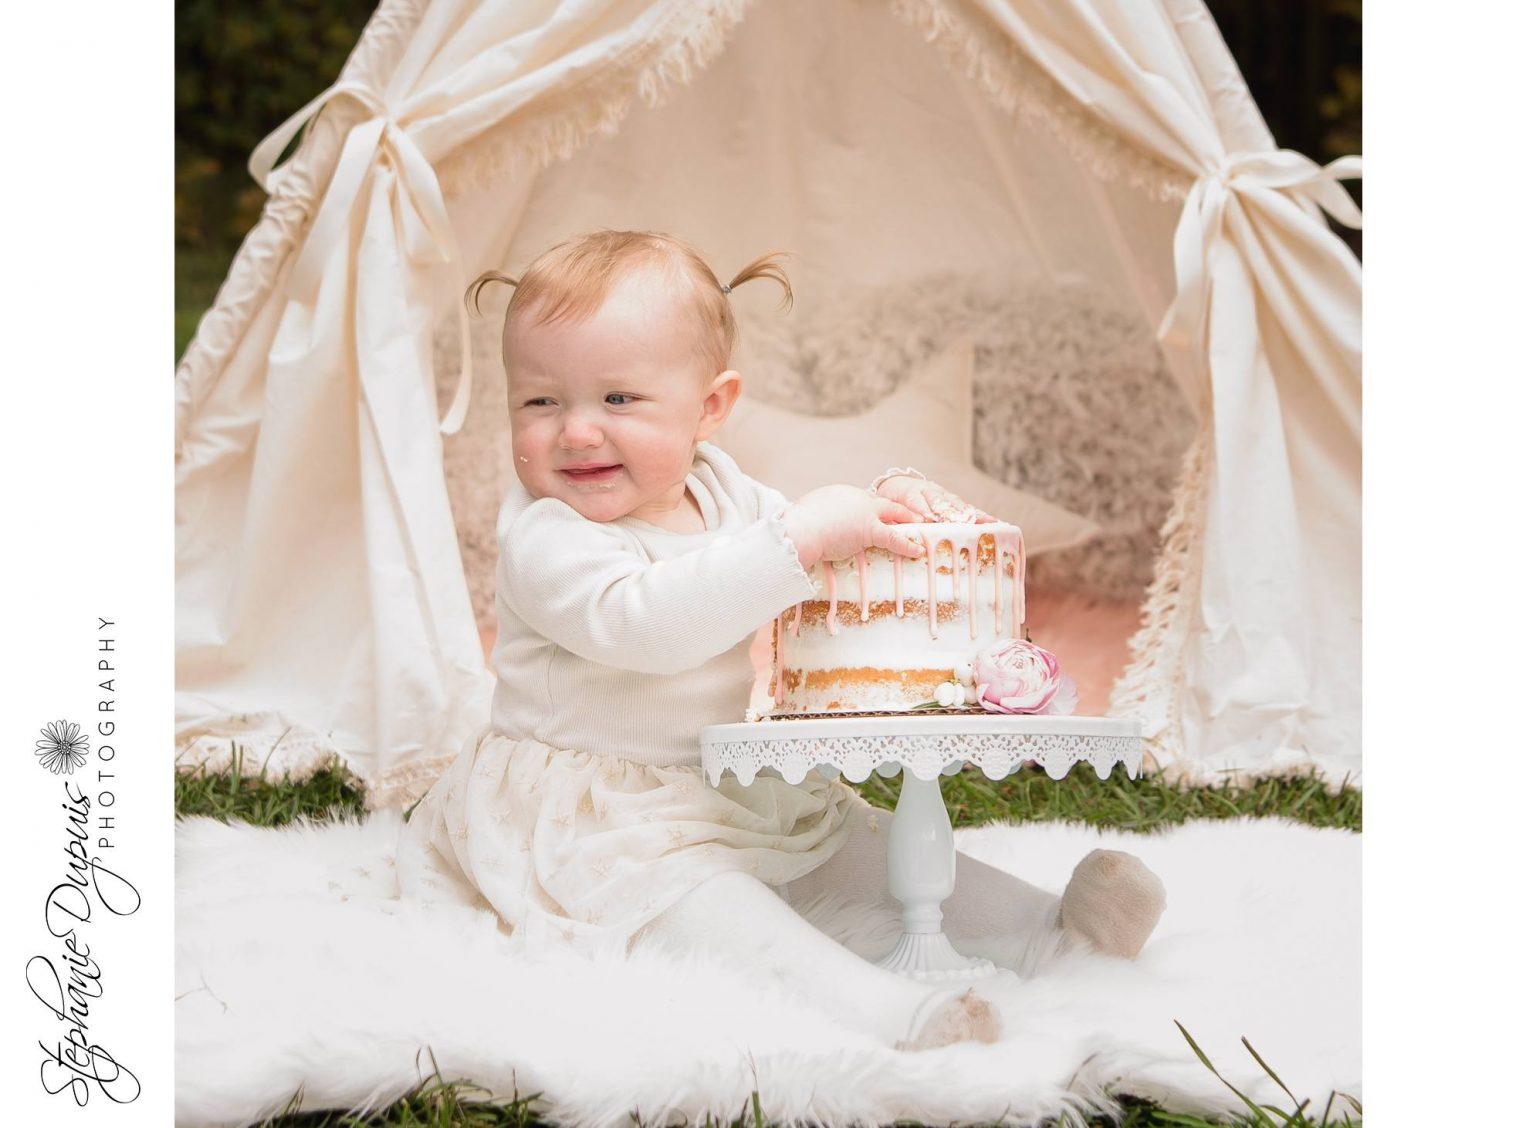 bromley cake smash 5 1536x1128 - Portfolio: Laura Mae Cake Smash